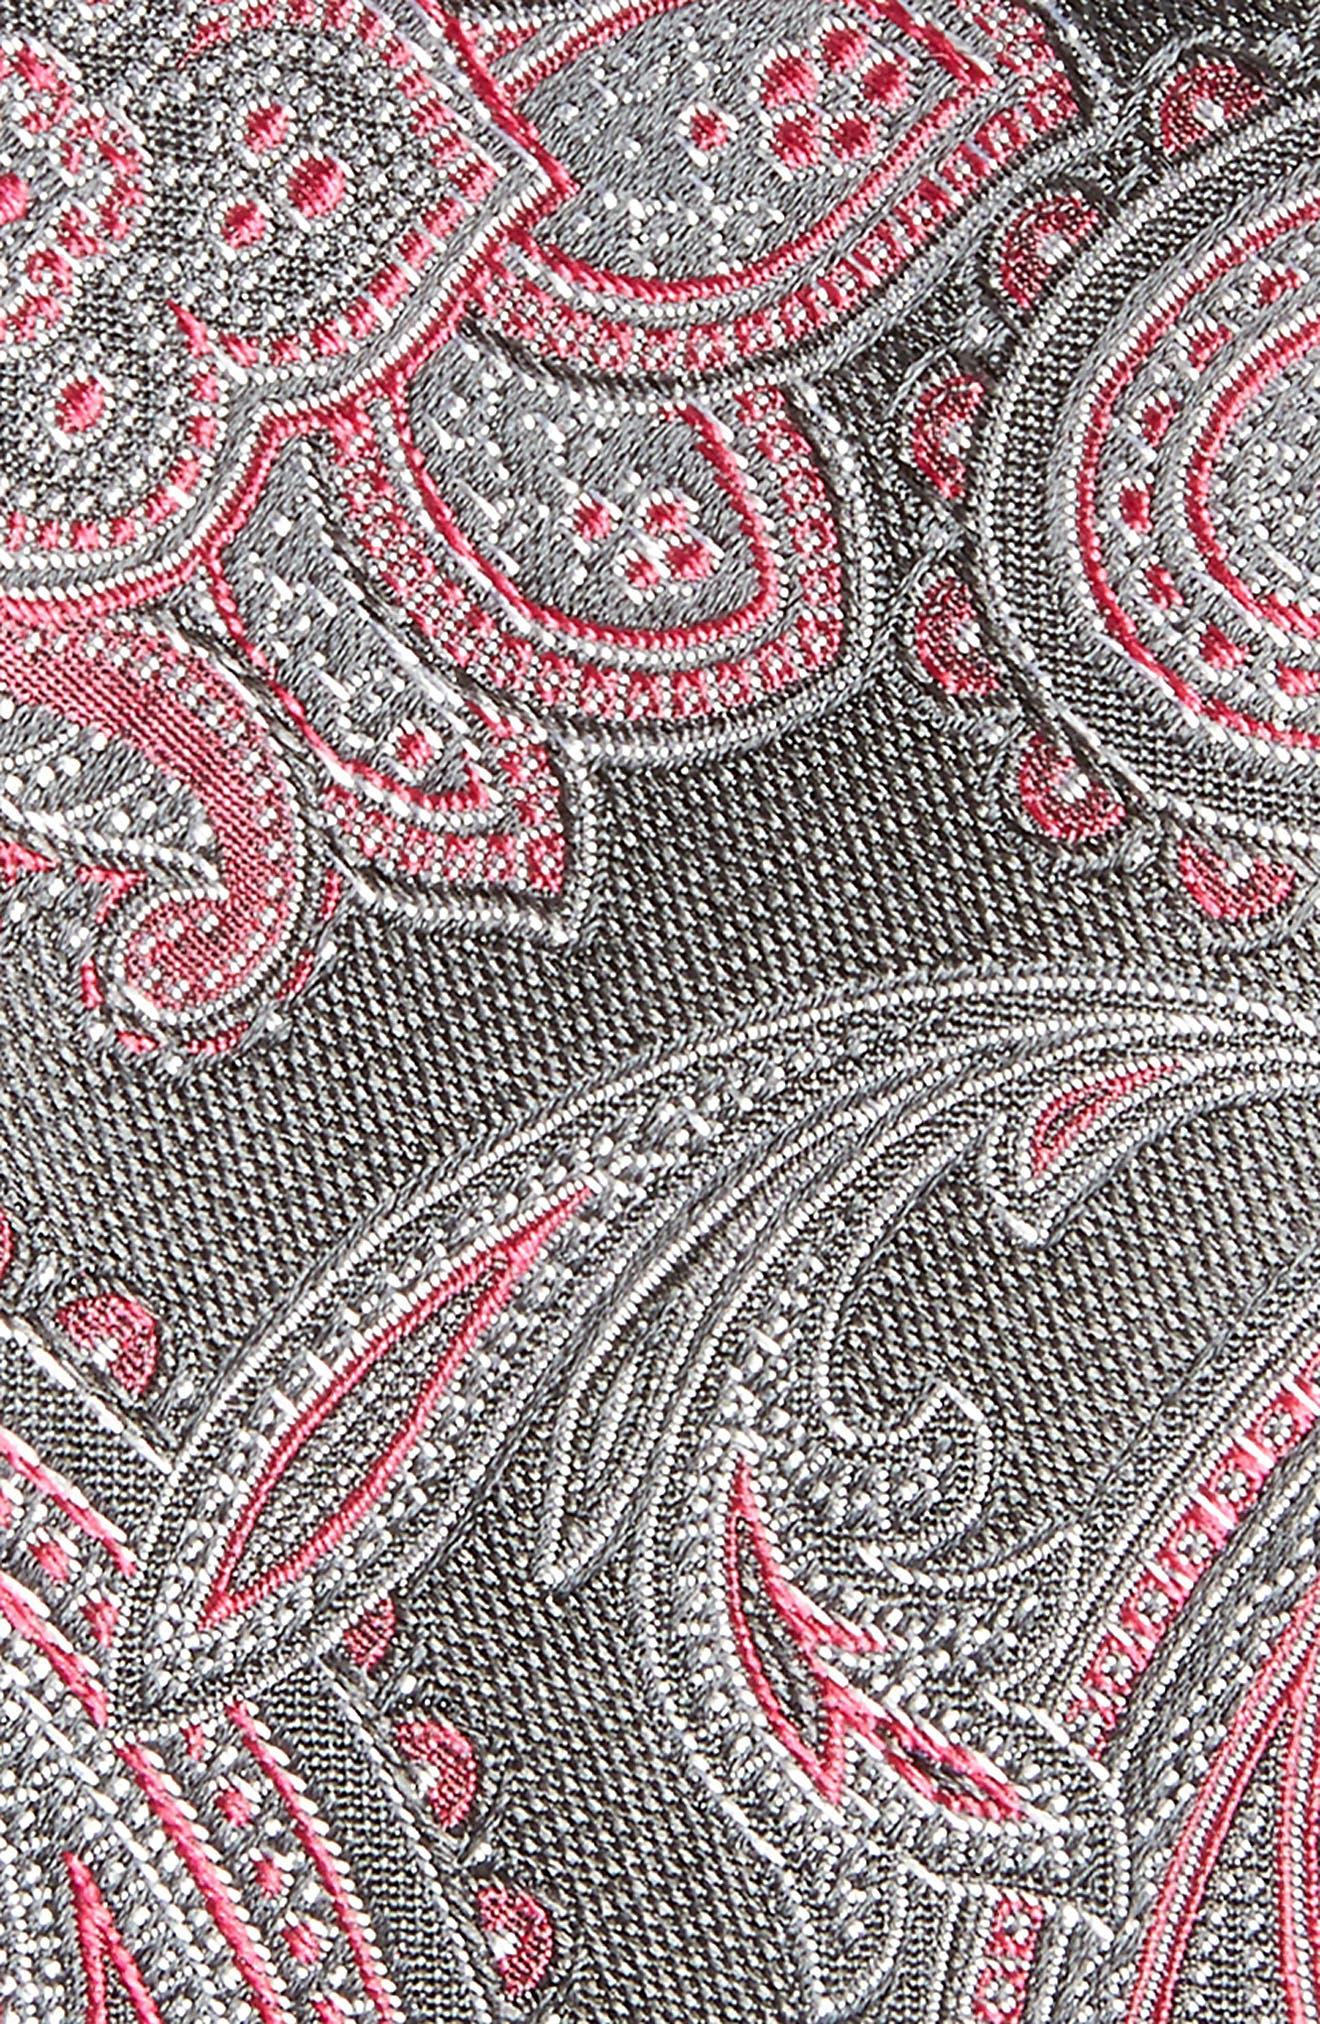 Barga Paisley Silk Tie,                             Alternate thumbnail 2, color,                             001